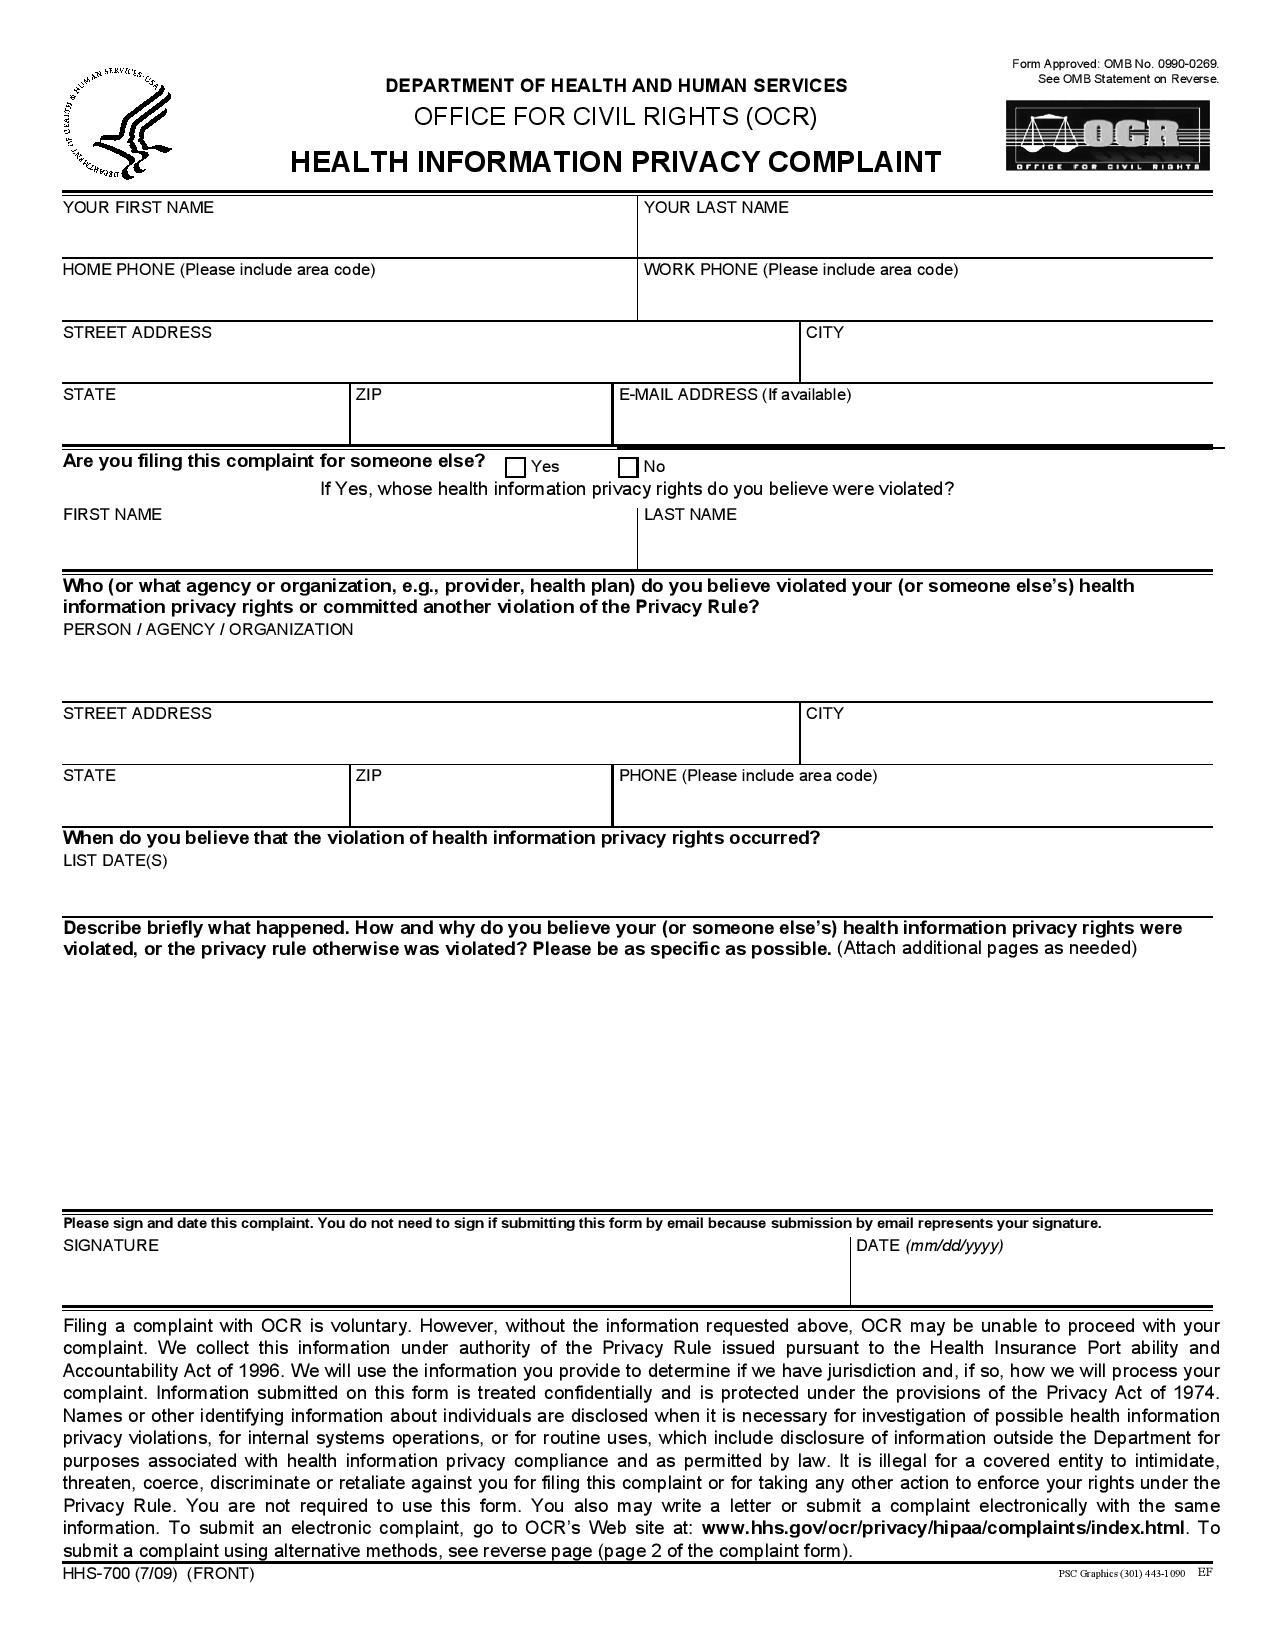 hipcomplaintform page 001